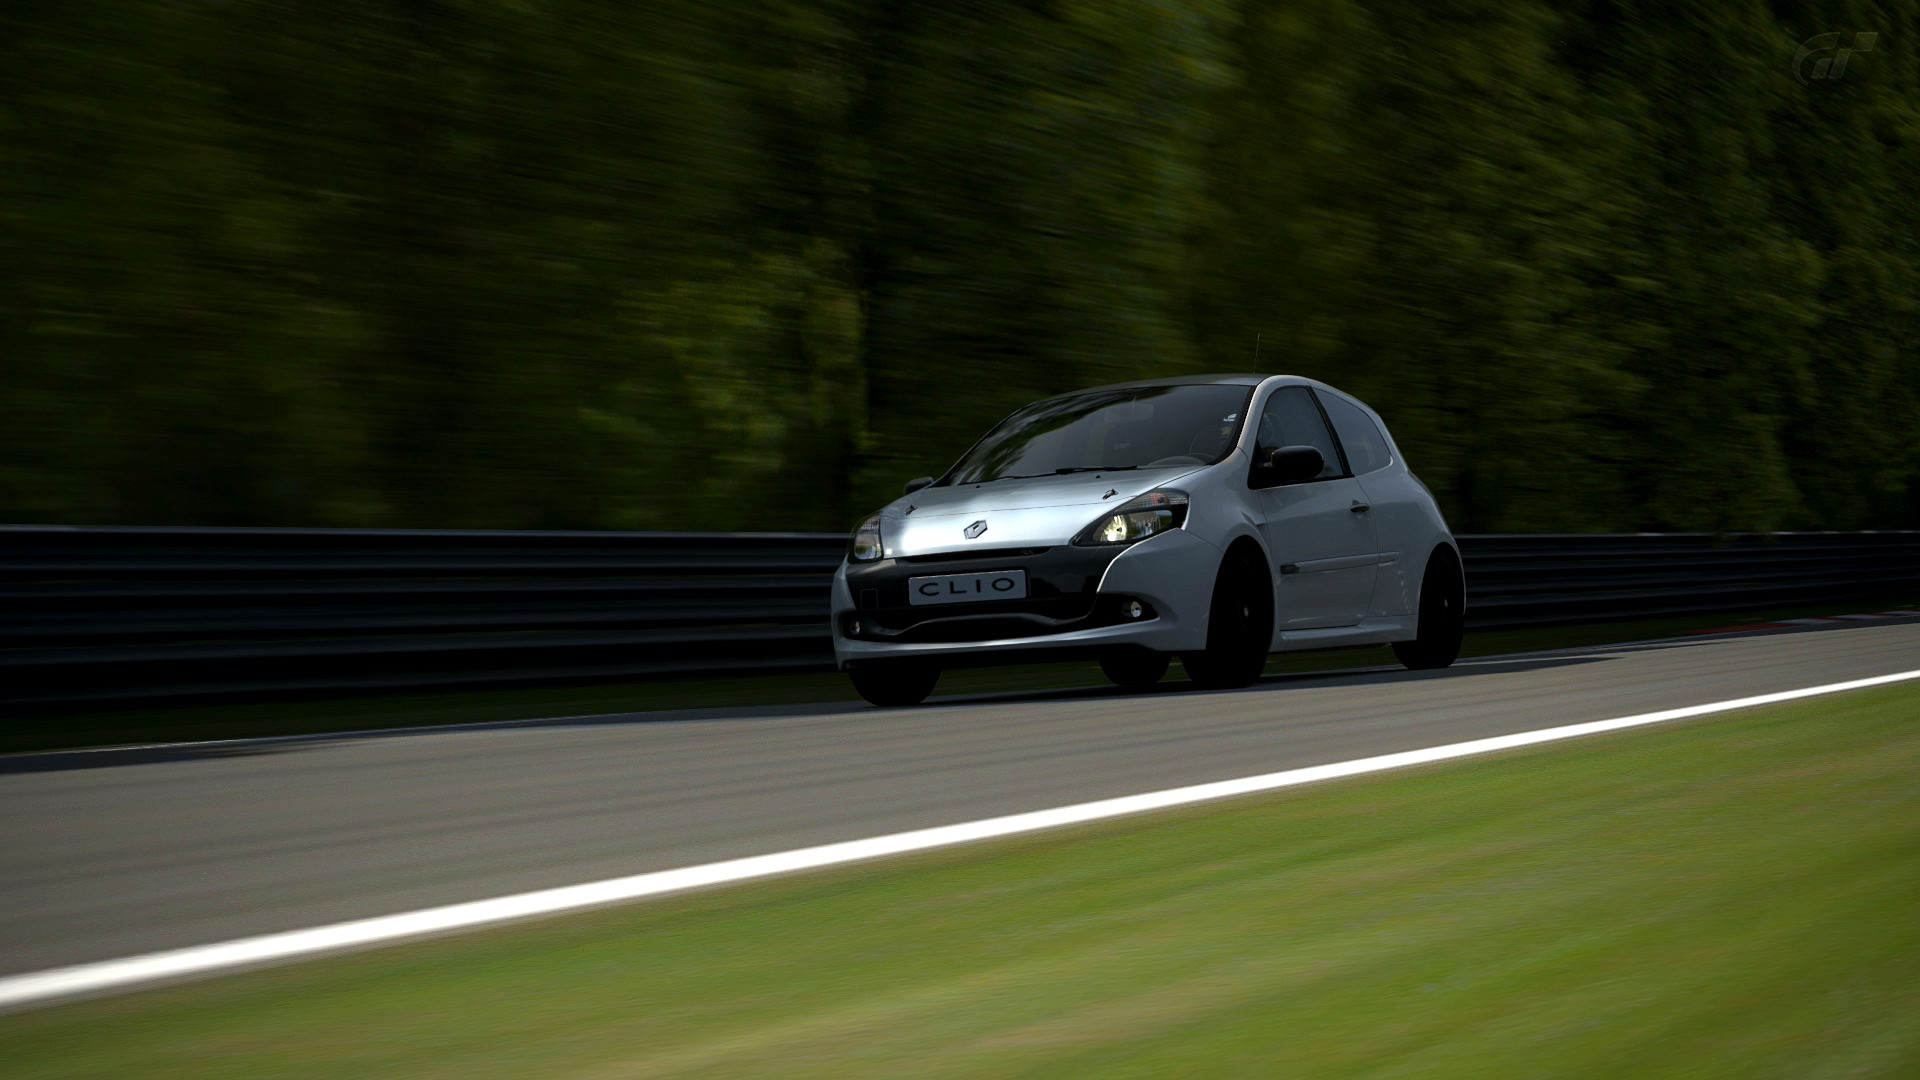 Nürburgring V-Typ_6.jpg